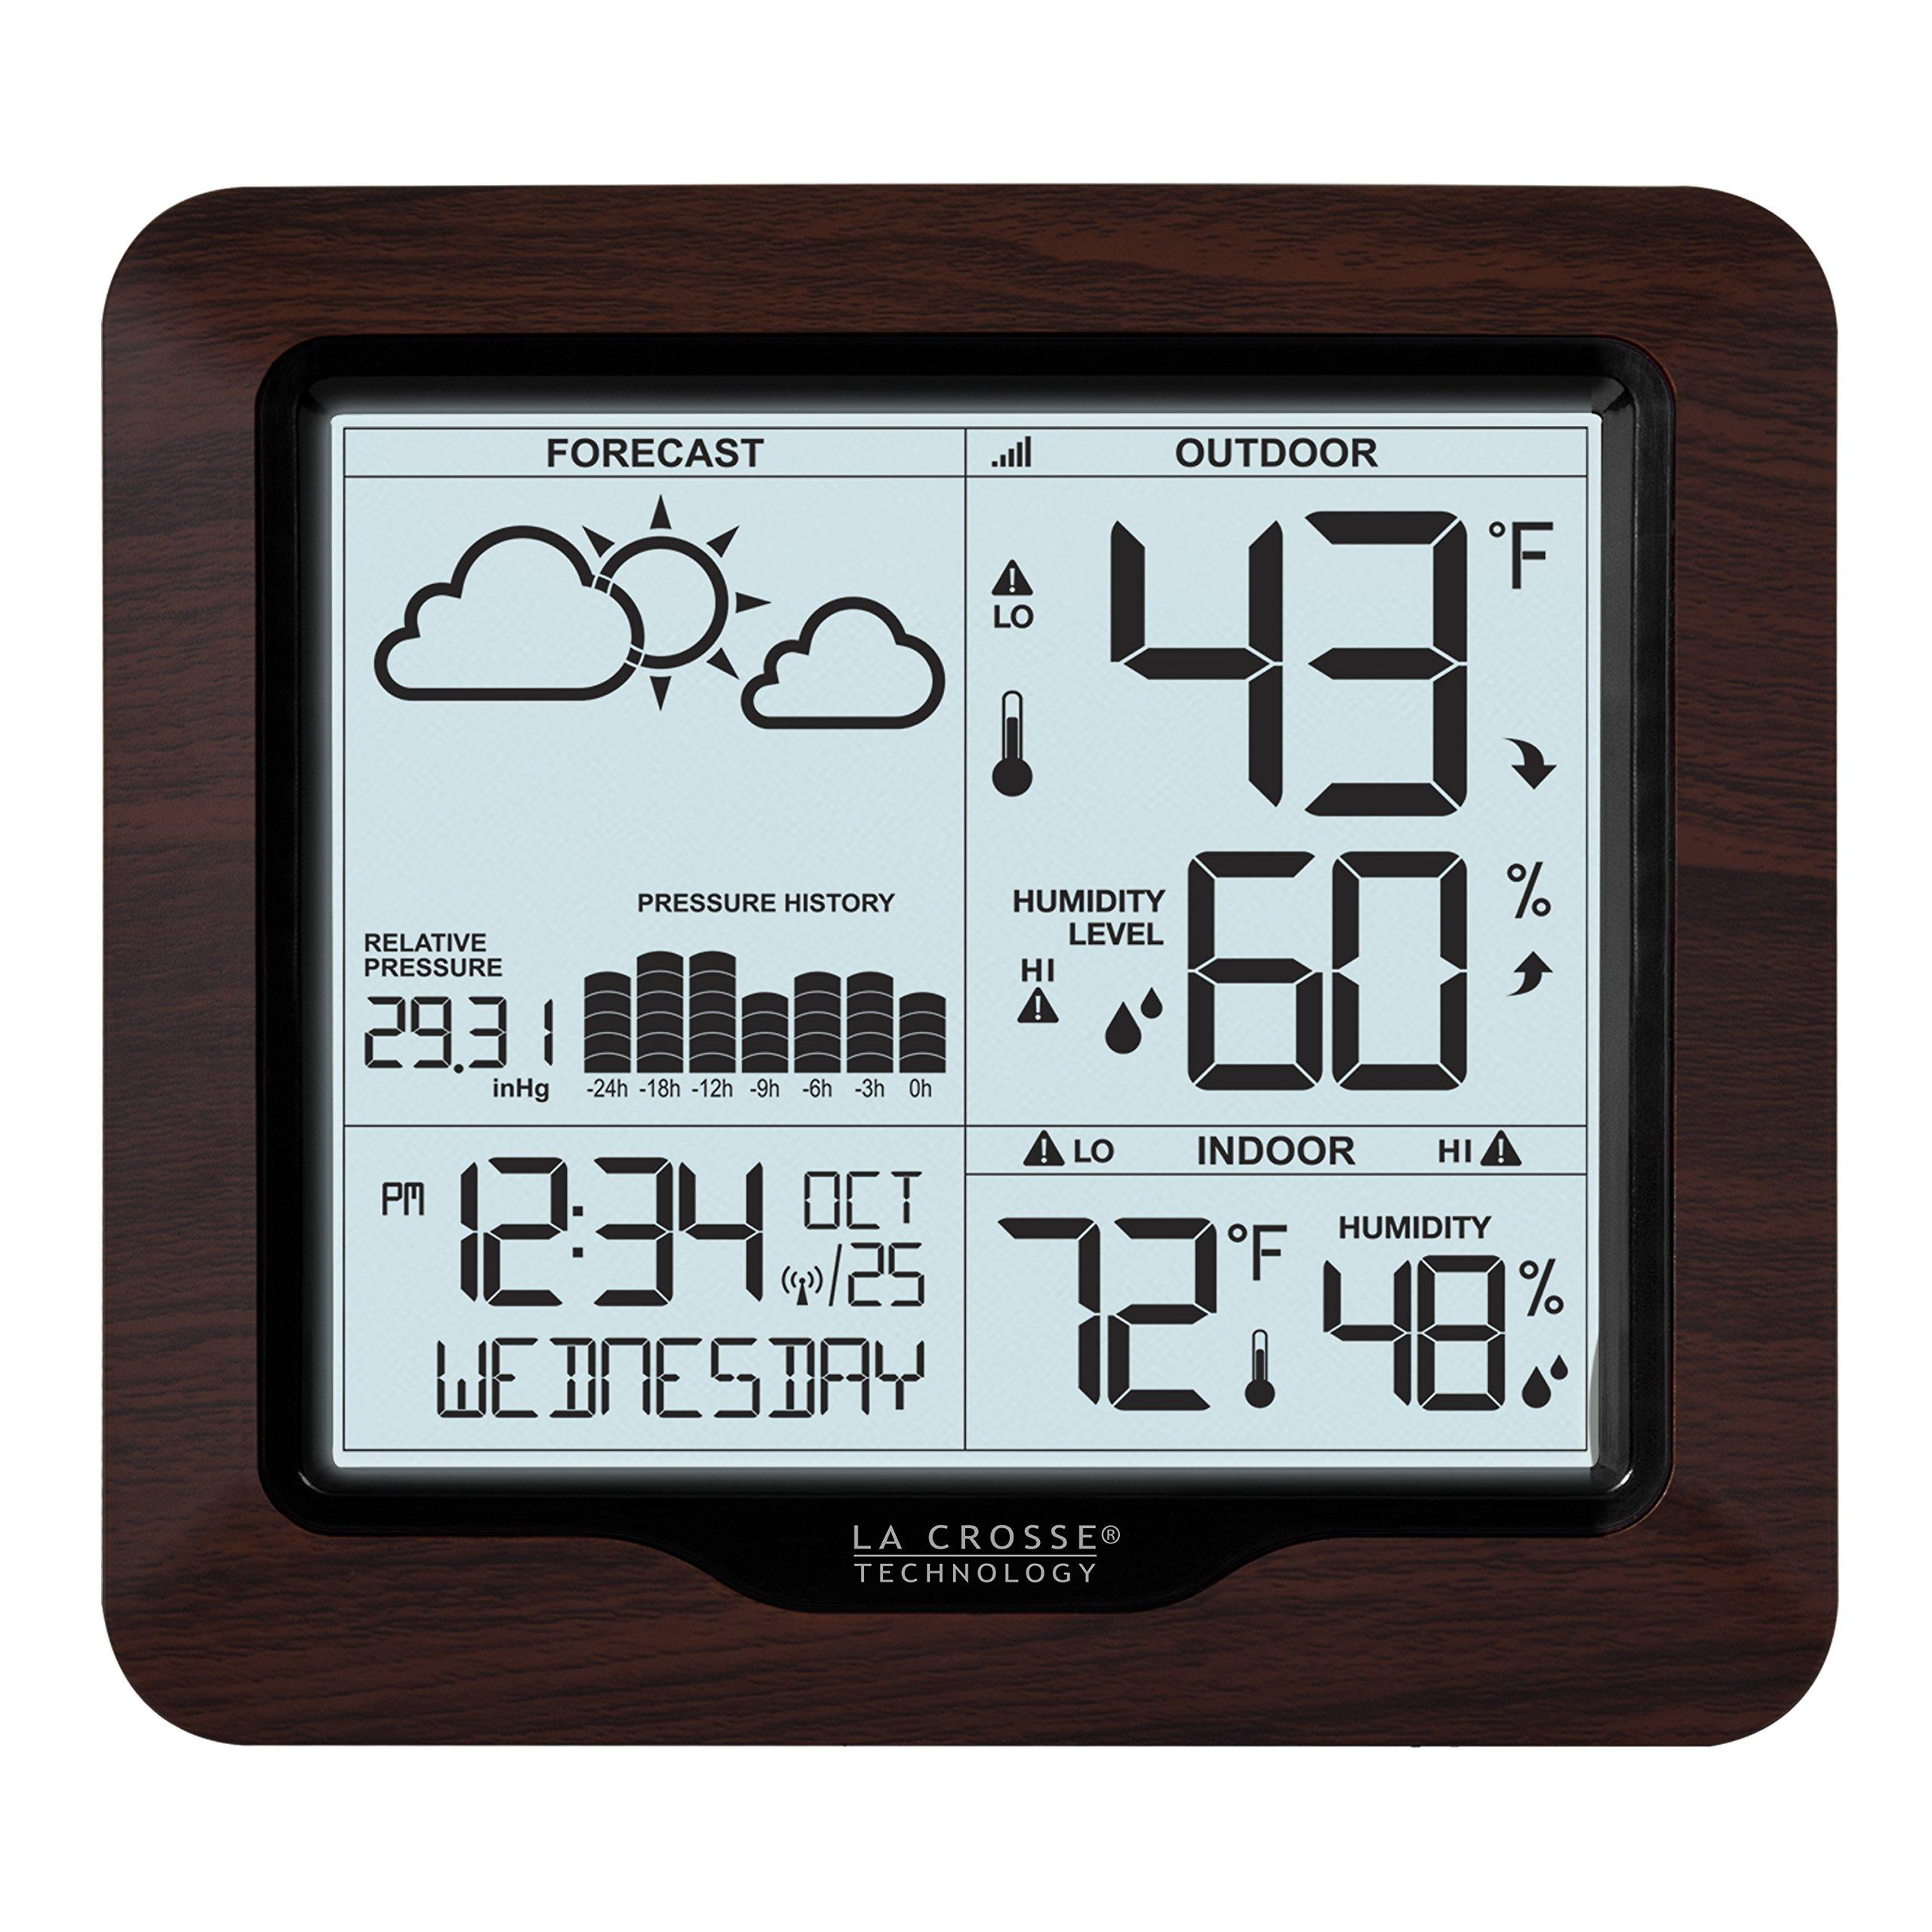 La Crosse Technology 308-1417BL Backlight Wireless Forecast Station with Pressure by La Crosse Technology